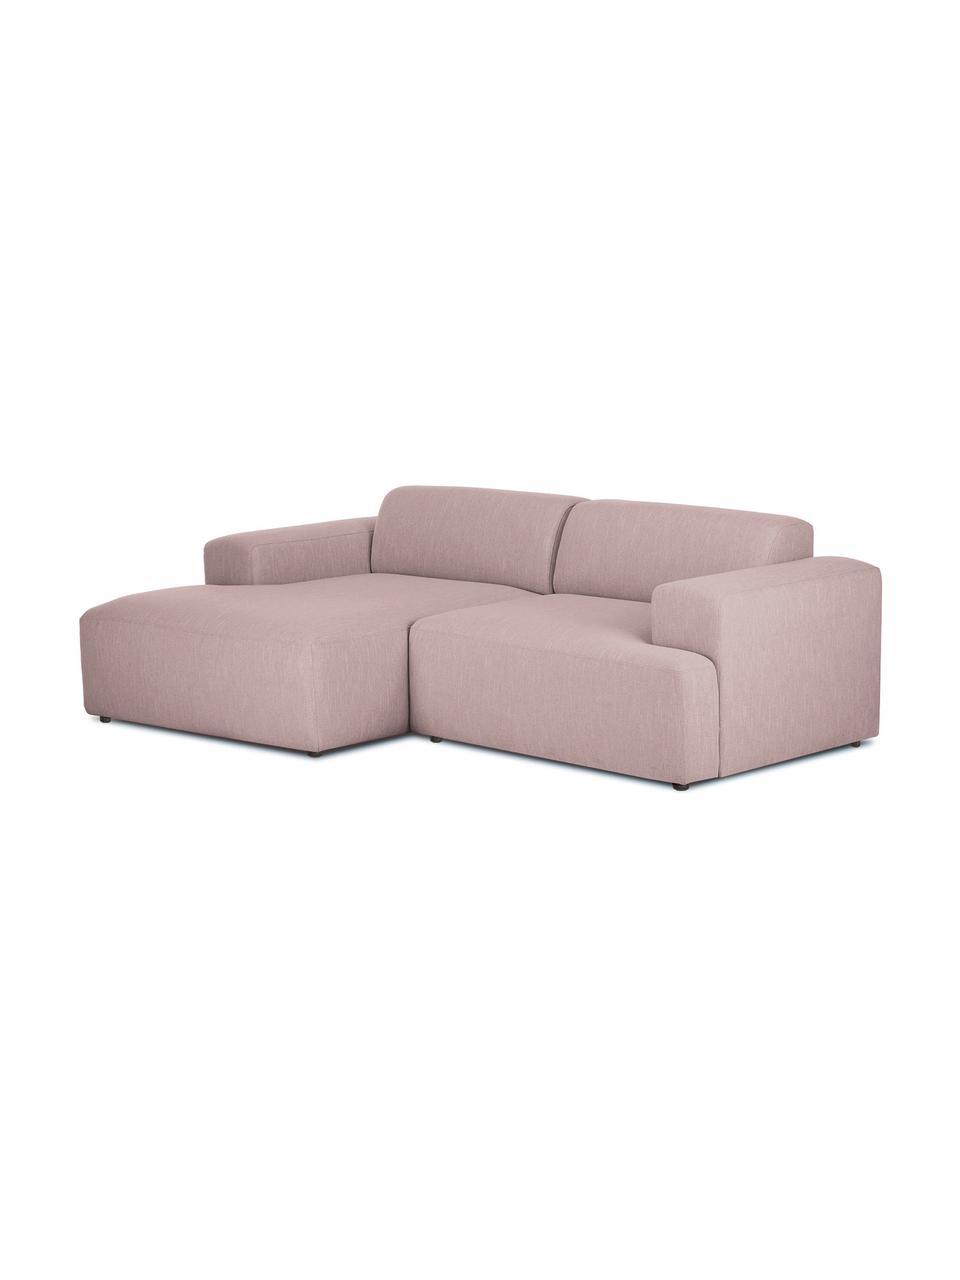 Ecksofa Melva (3-Sitzer) in Rosa, Bezug: 100% Polyester Der hochwe, Gestell: Massives Kiefernholz, FSC, Füße: Kunststoff, Webstoff Rosa, B 239 x T 143 cm